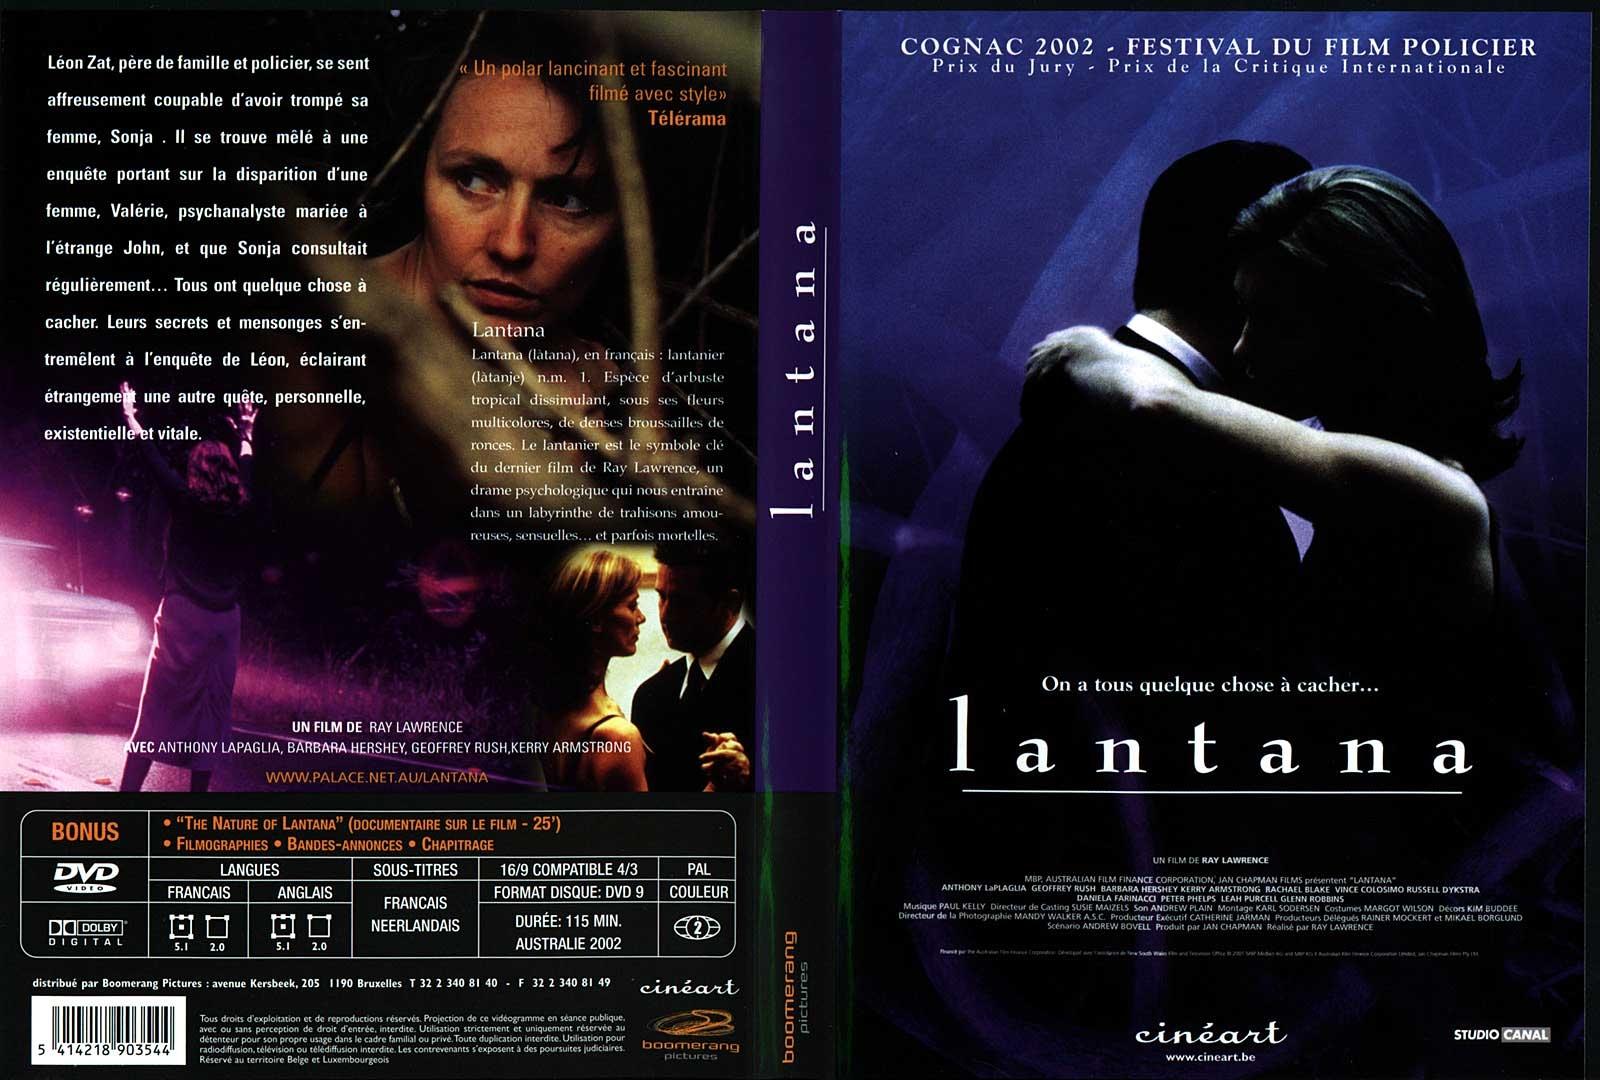 Jaquette DVD Lantana